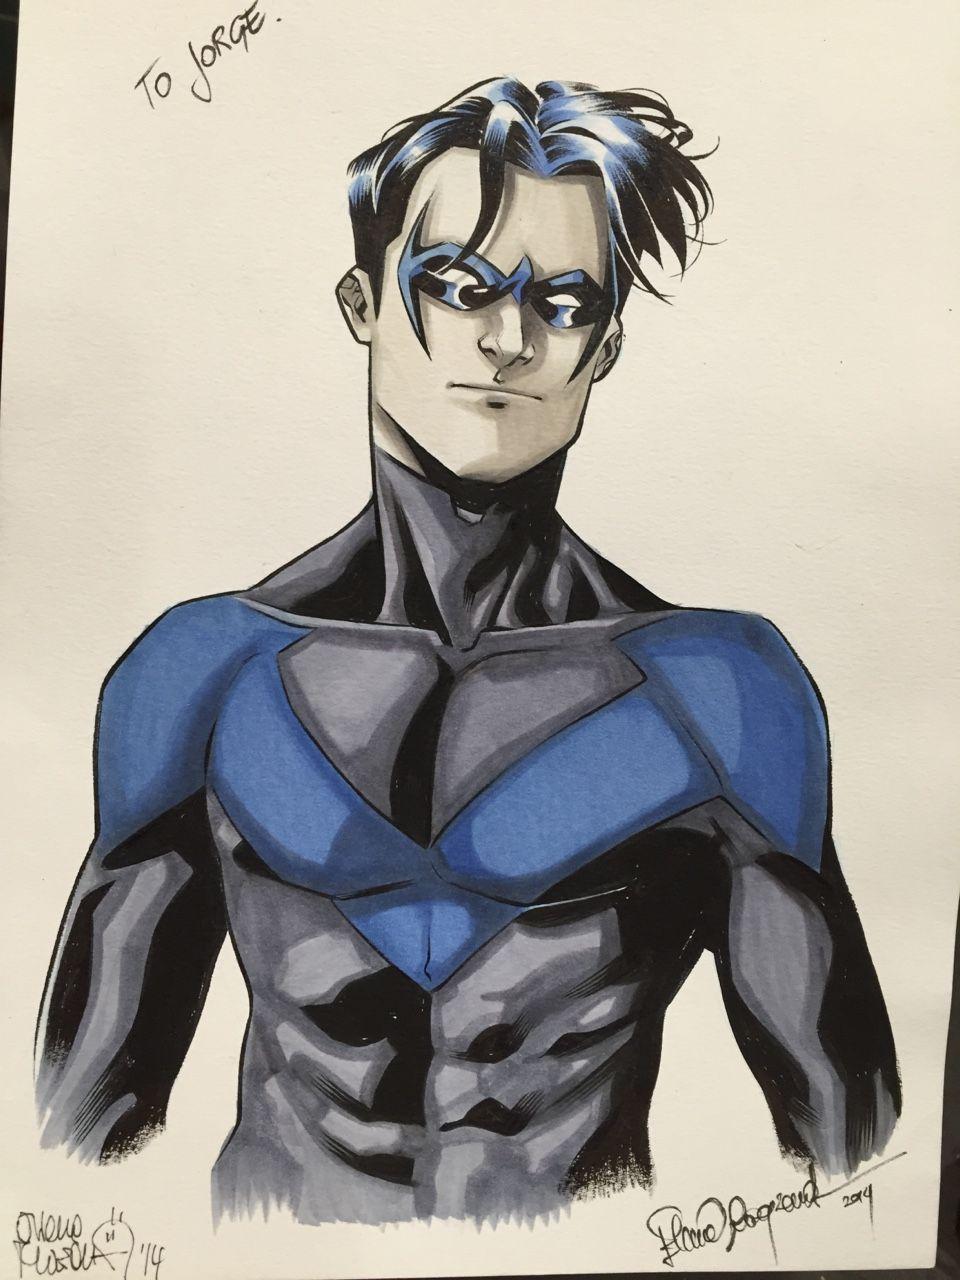 Nightwing, Dick Grayson